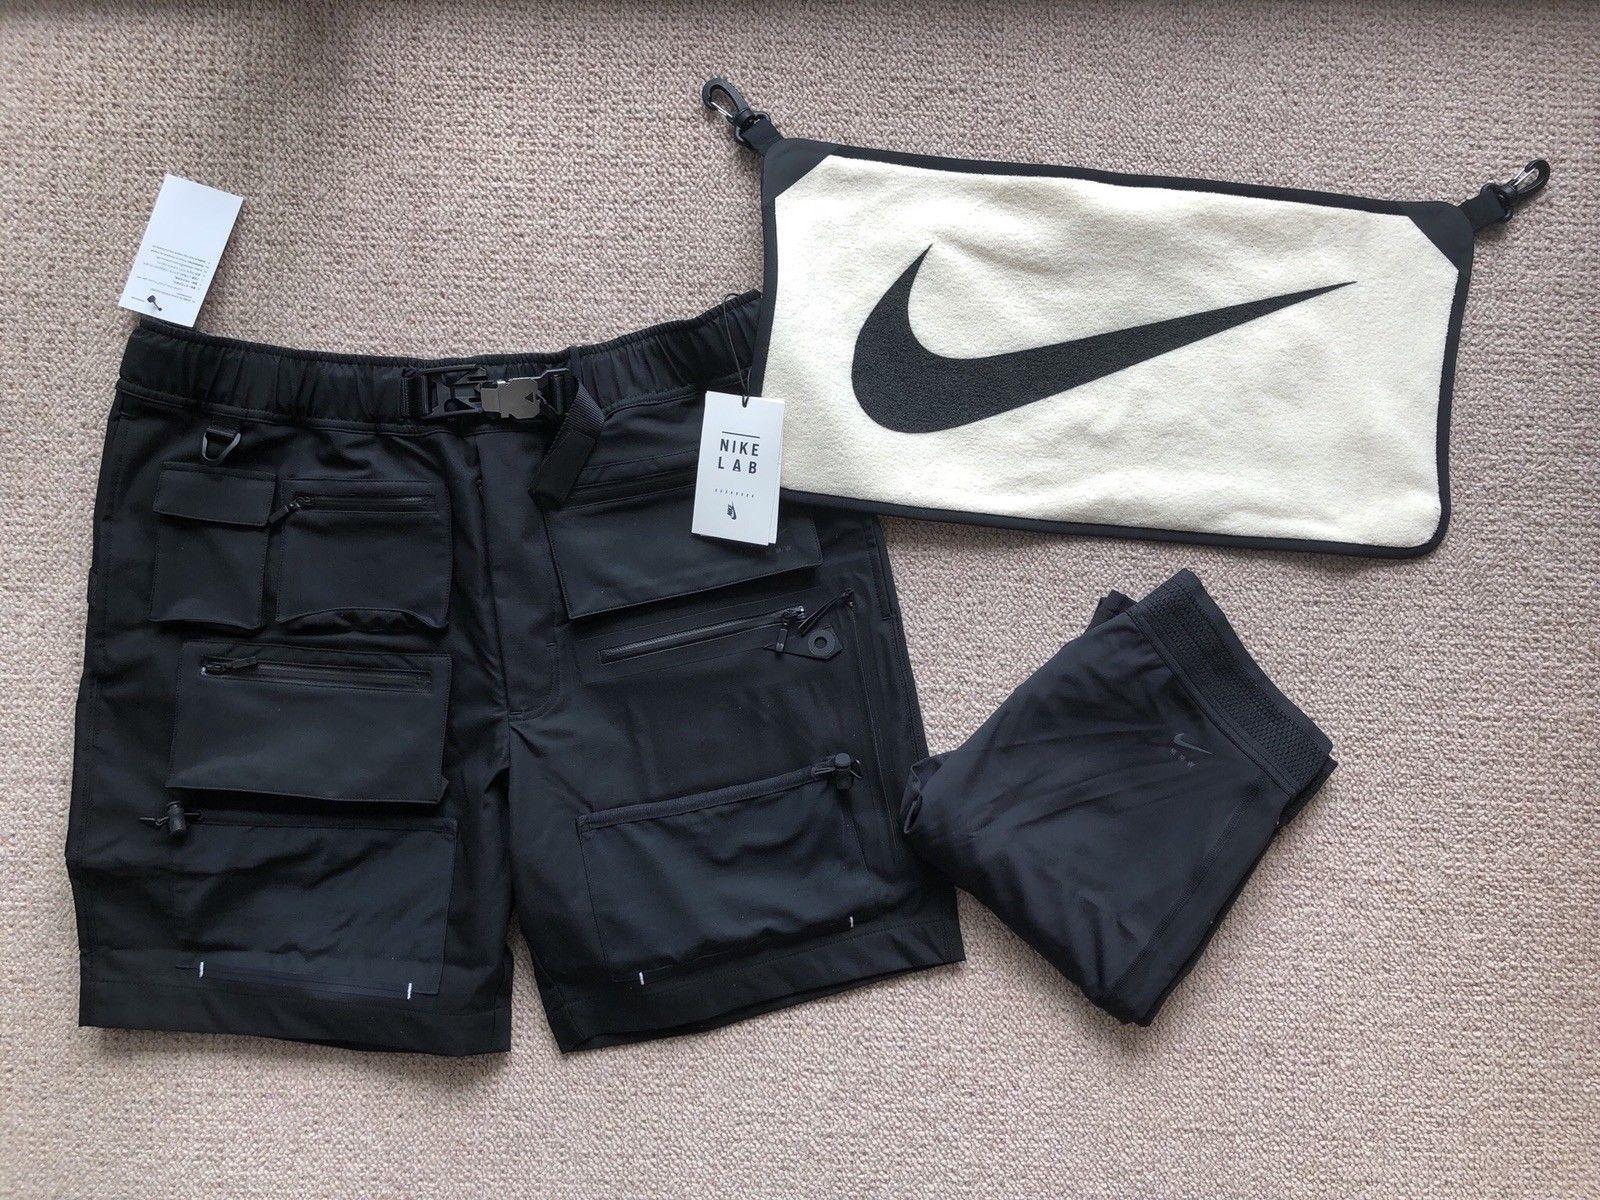 6 month nike shorts